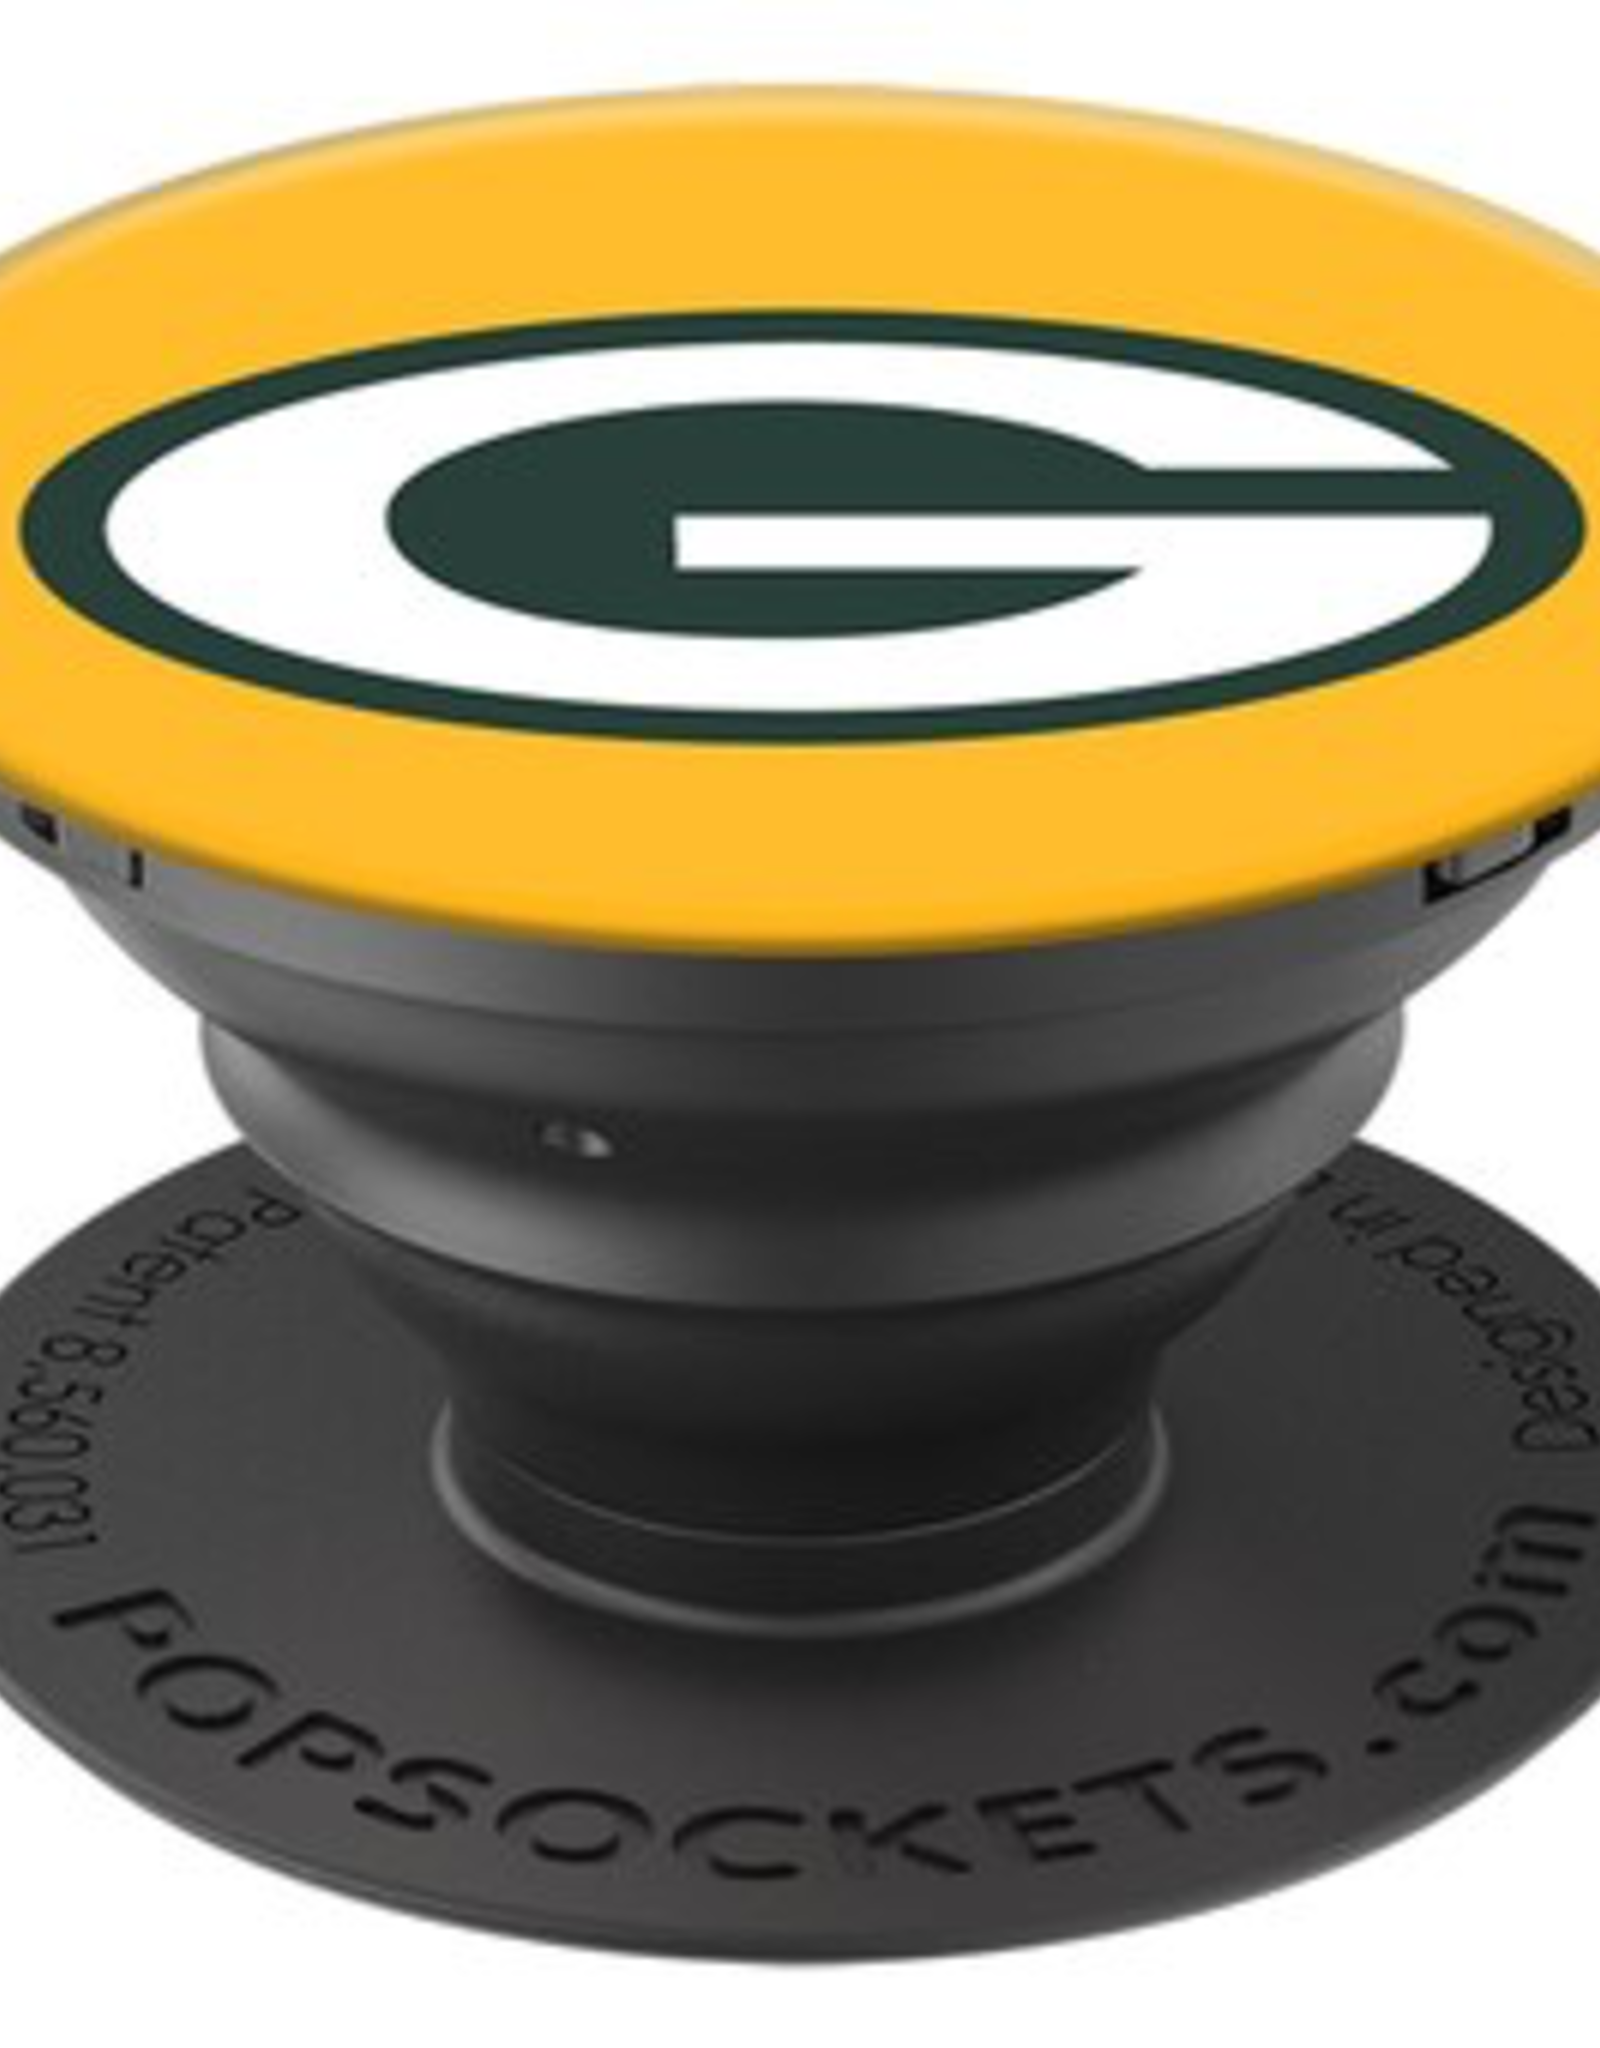 POPSOCKETS LLC Green Bay Packers PopSockets Cell Phone Holder